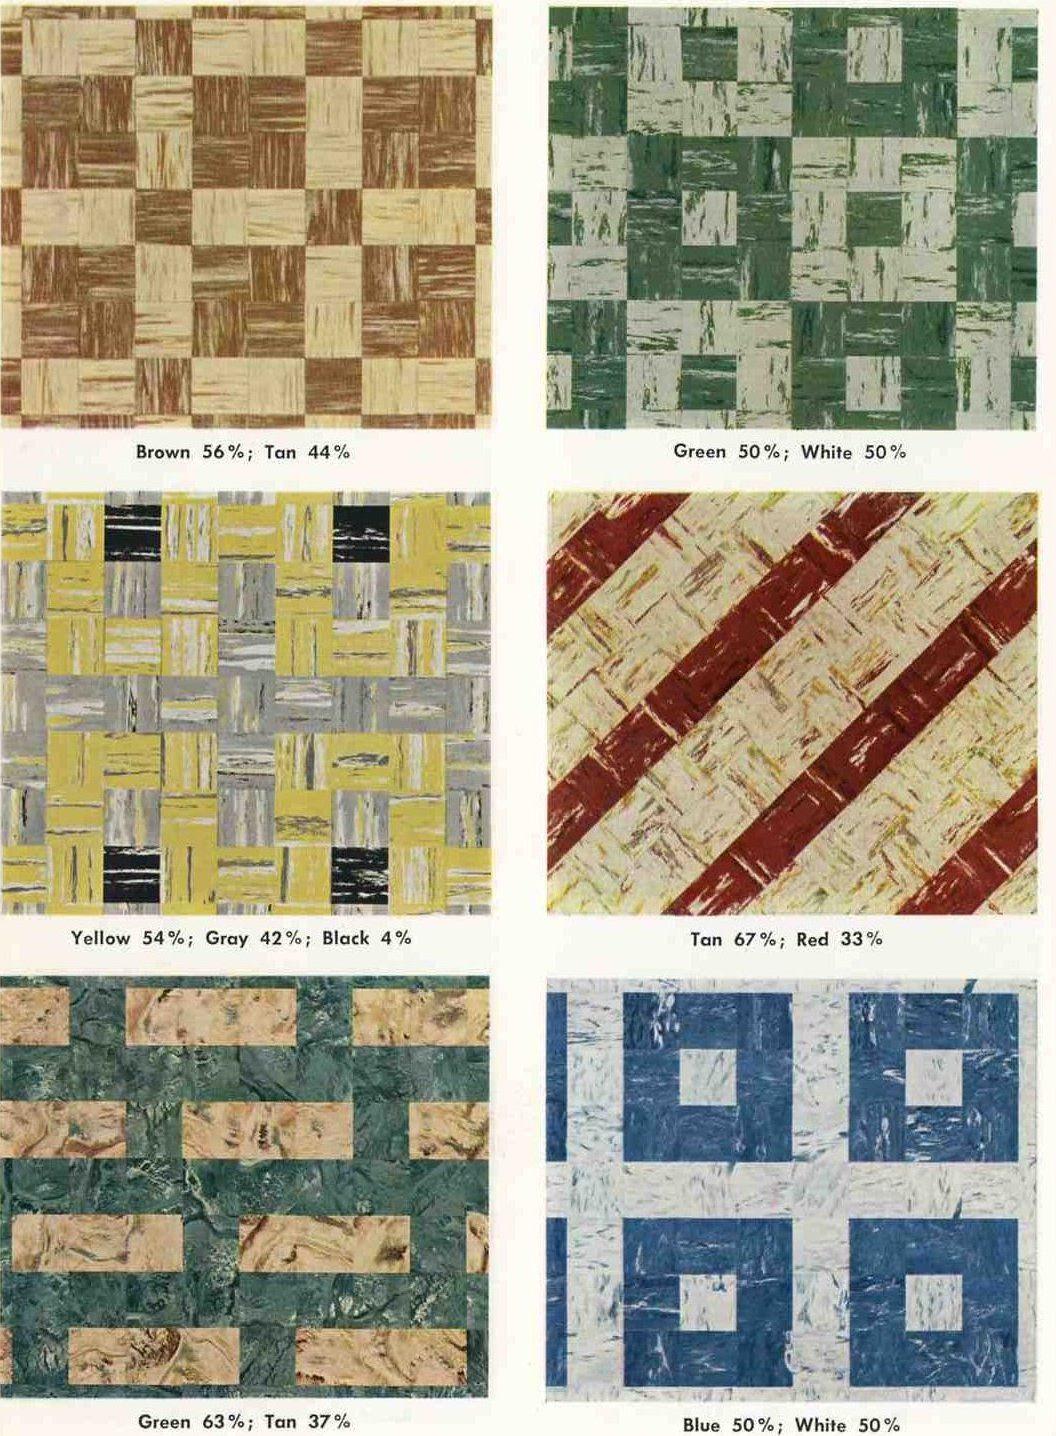 30 patterns for vinyl floor tiles from the 1950s